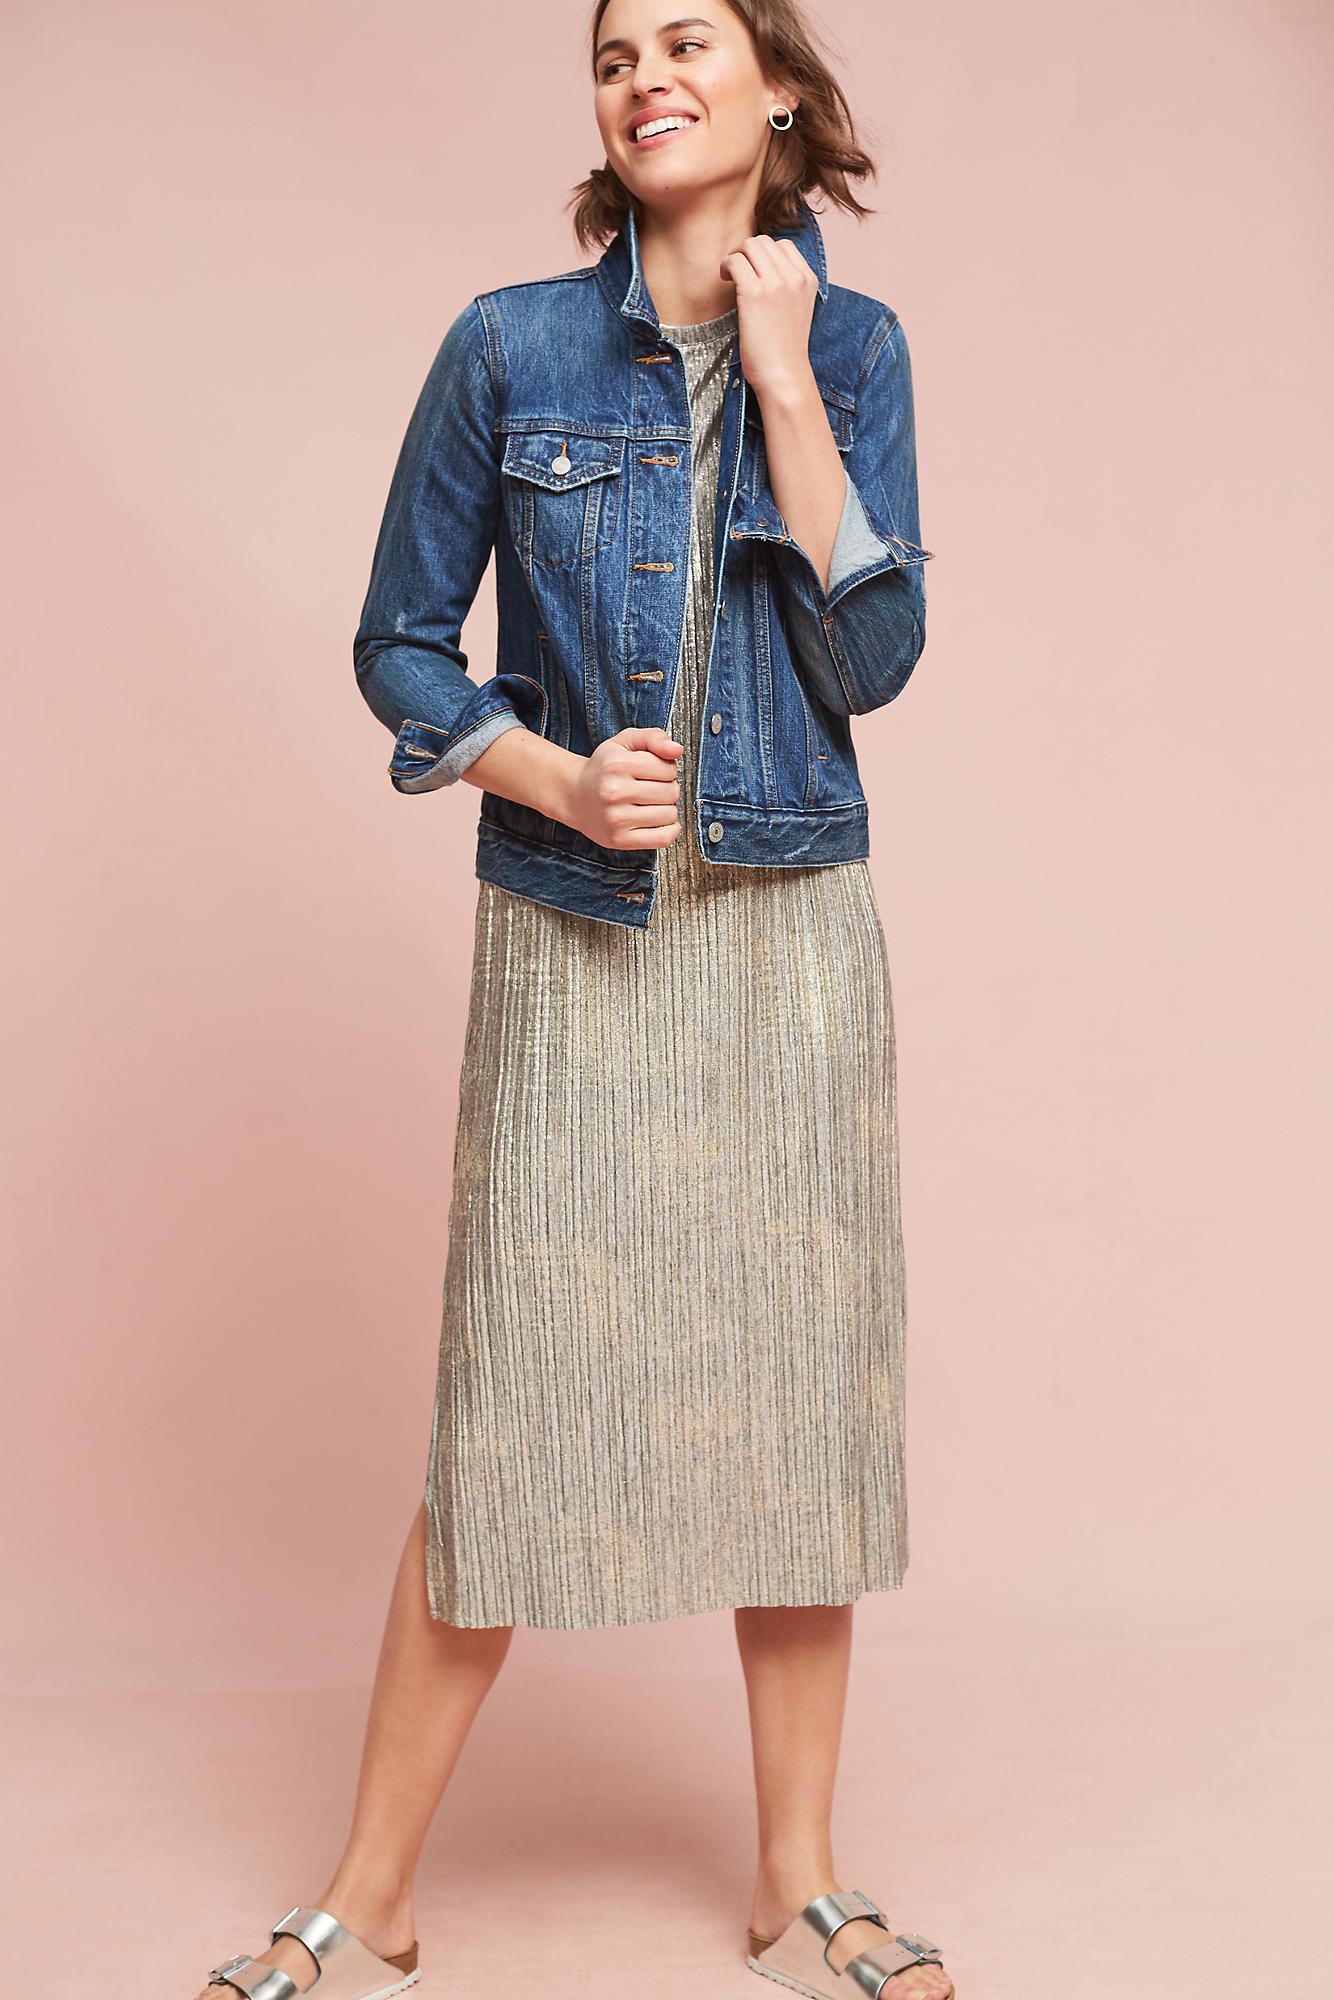 ebec1c941f51 Akemi + Kin Corrina Metallic Dress in Gray - Lyst